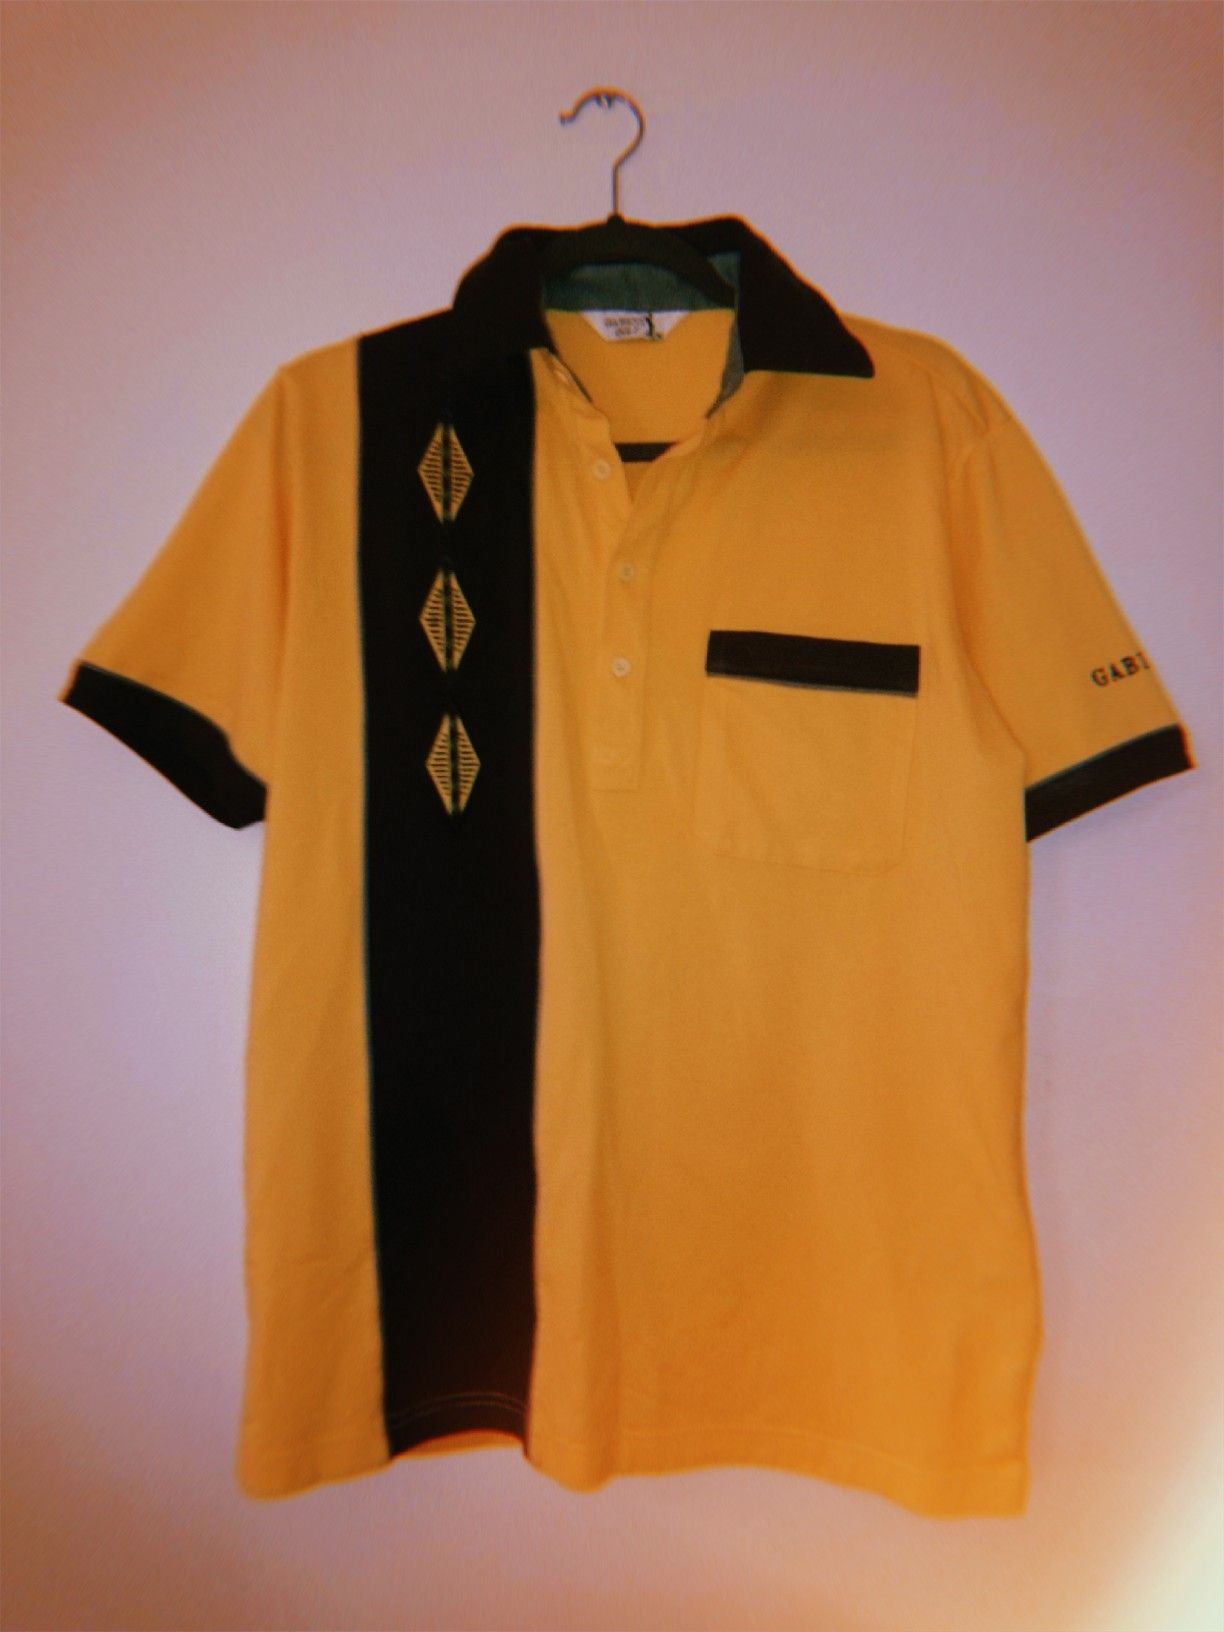 Vintage Italian Golf Shirt Brand Gabicci Womens Golf Fashion Golf Fashion Blue Polo Shirts